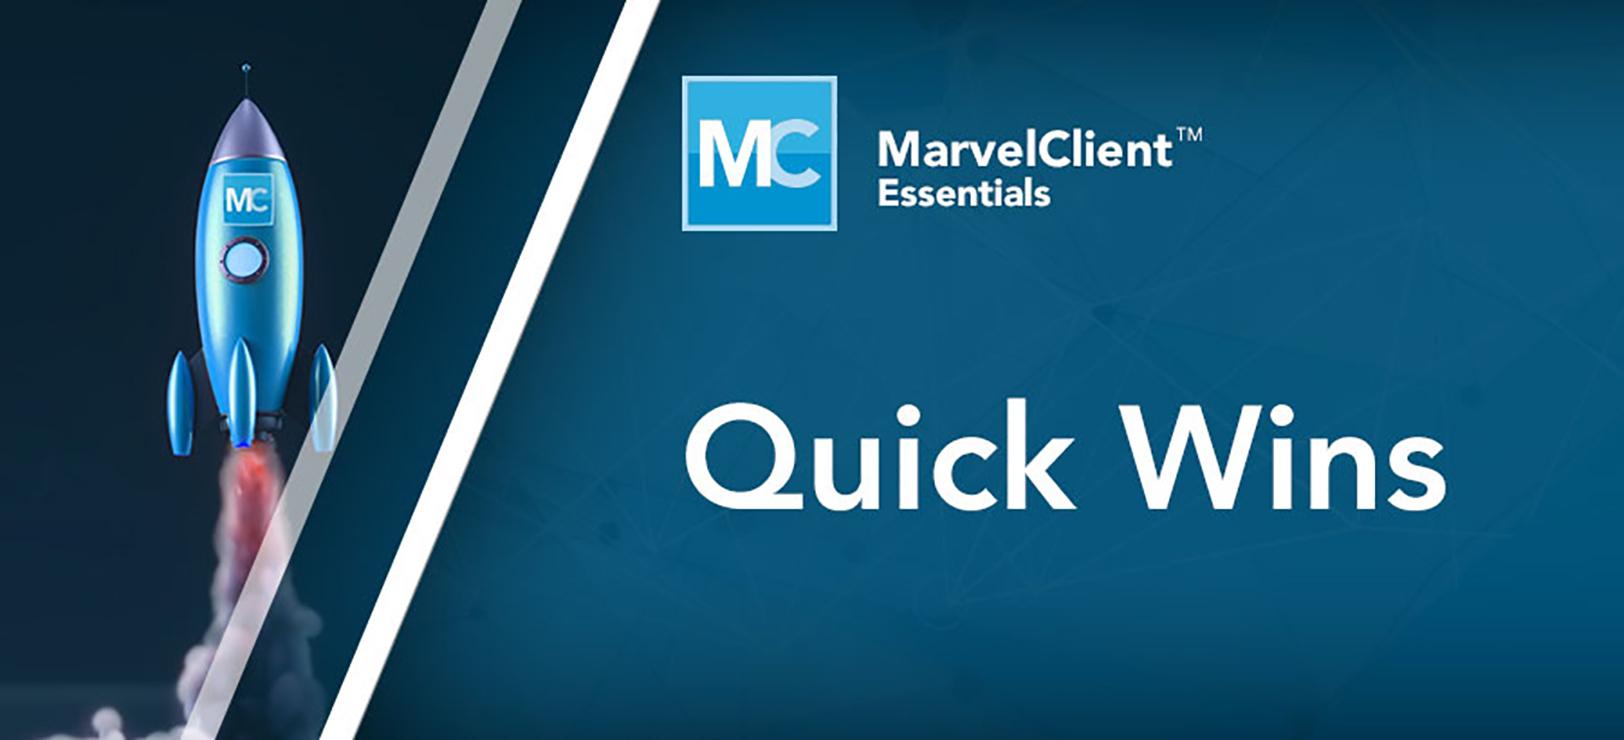 marvelclient_essentials_quick-wins